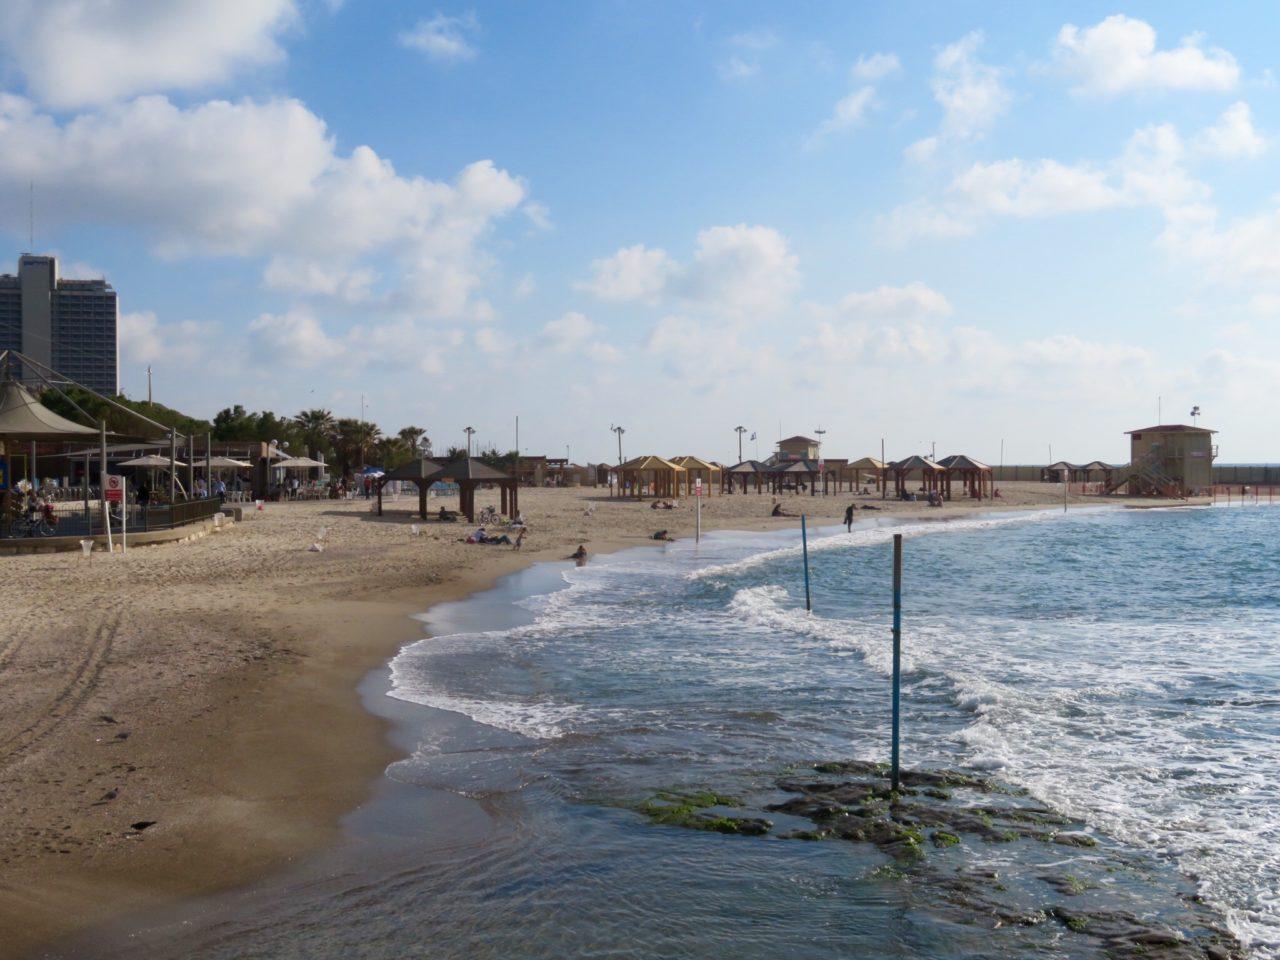 Tel Aviv Beach : The Metzitzim Beach, just south of the Old Port of Tel Aviv